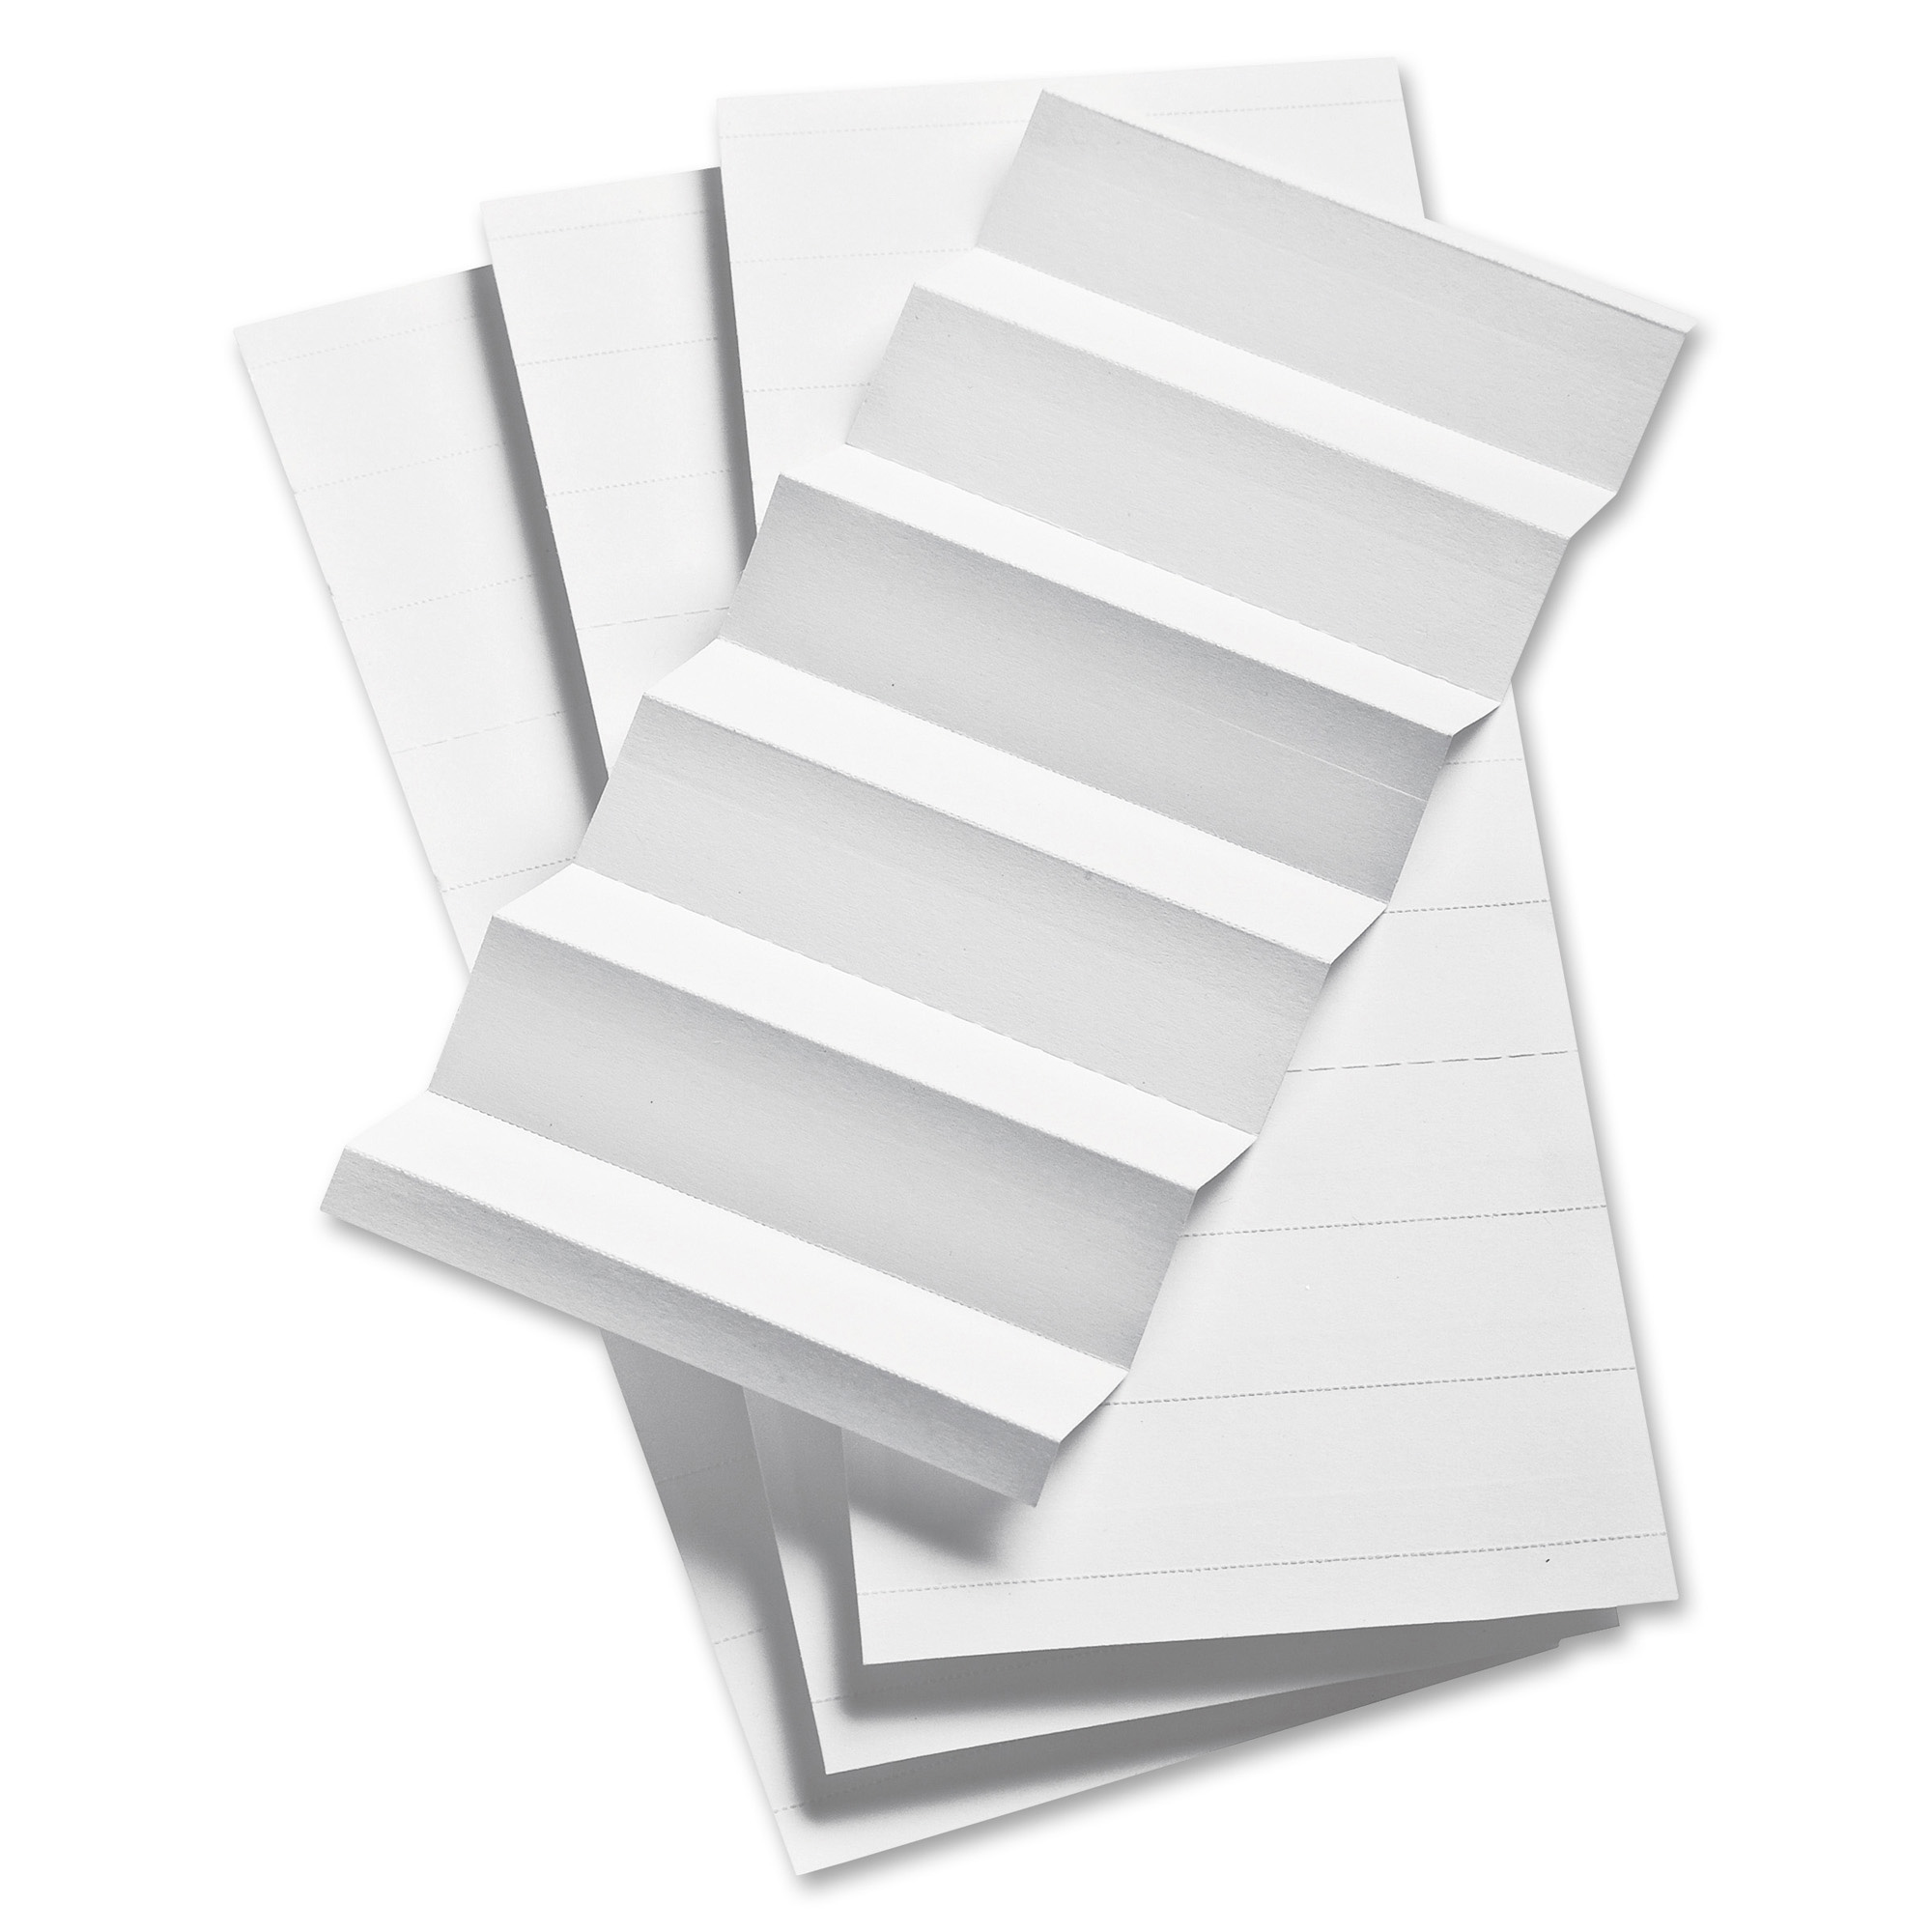 1 3 Cut Hanging File Folder Tab Template